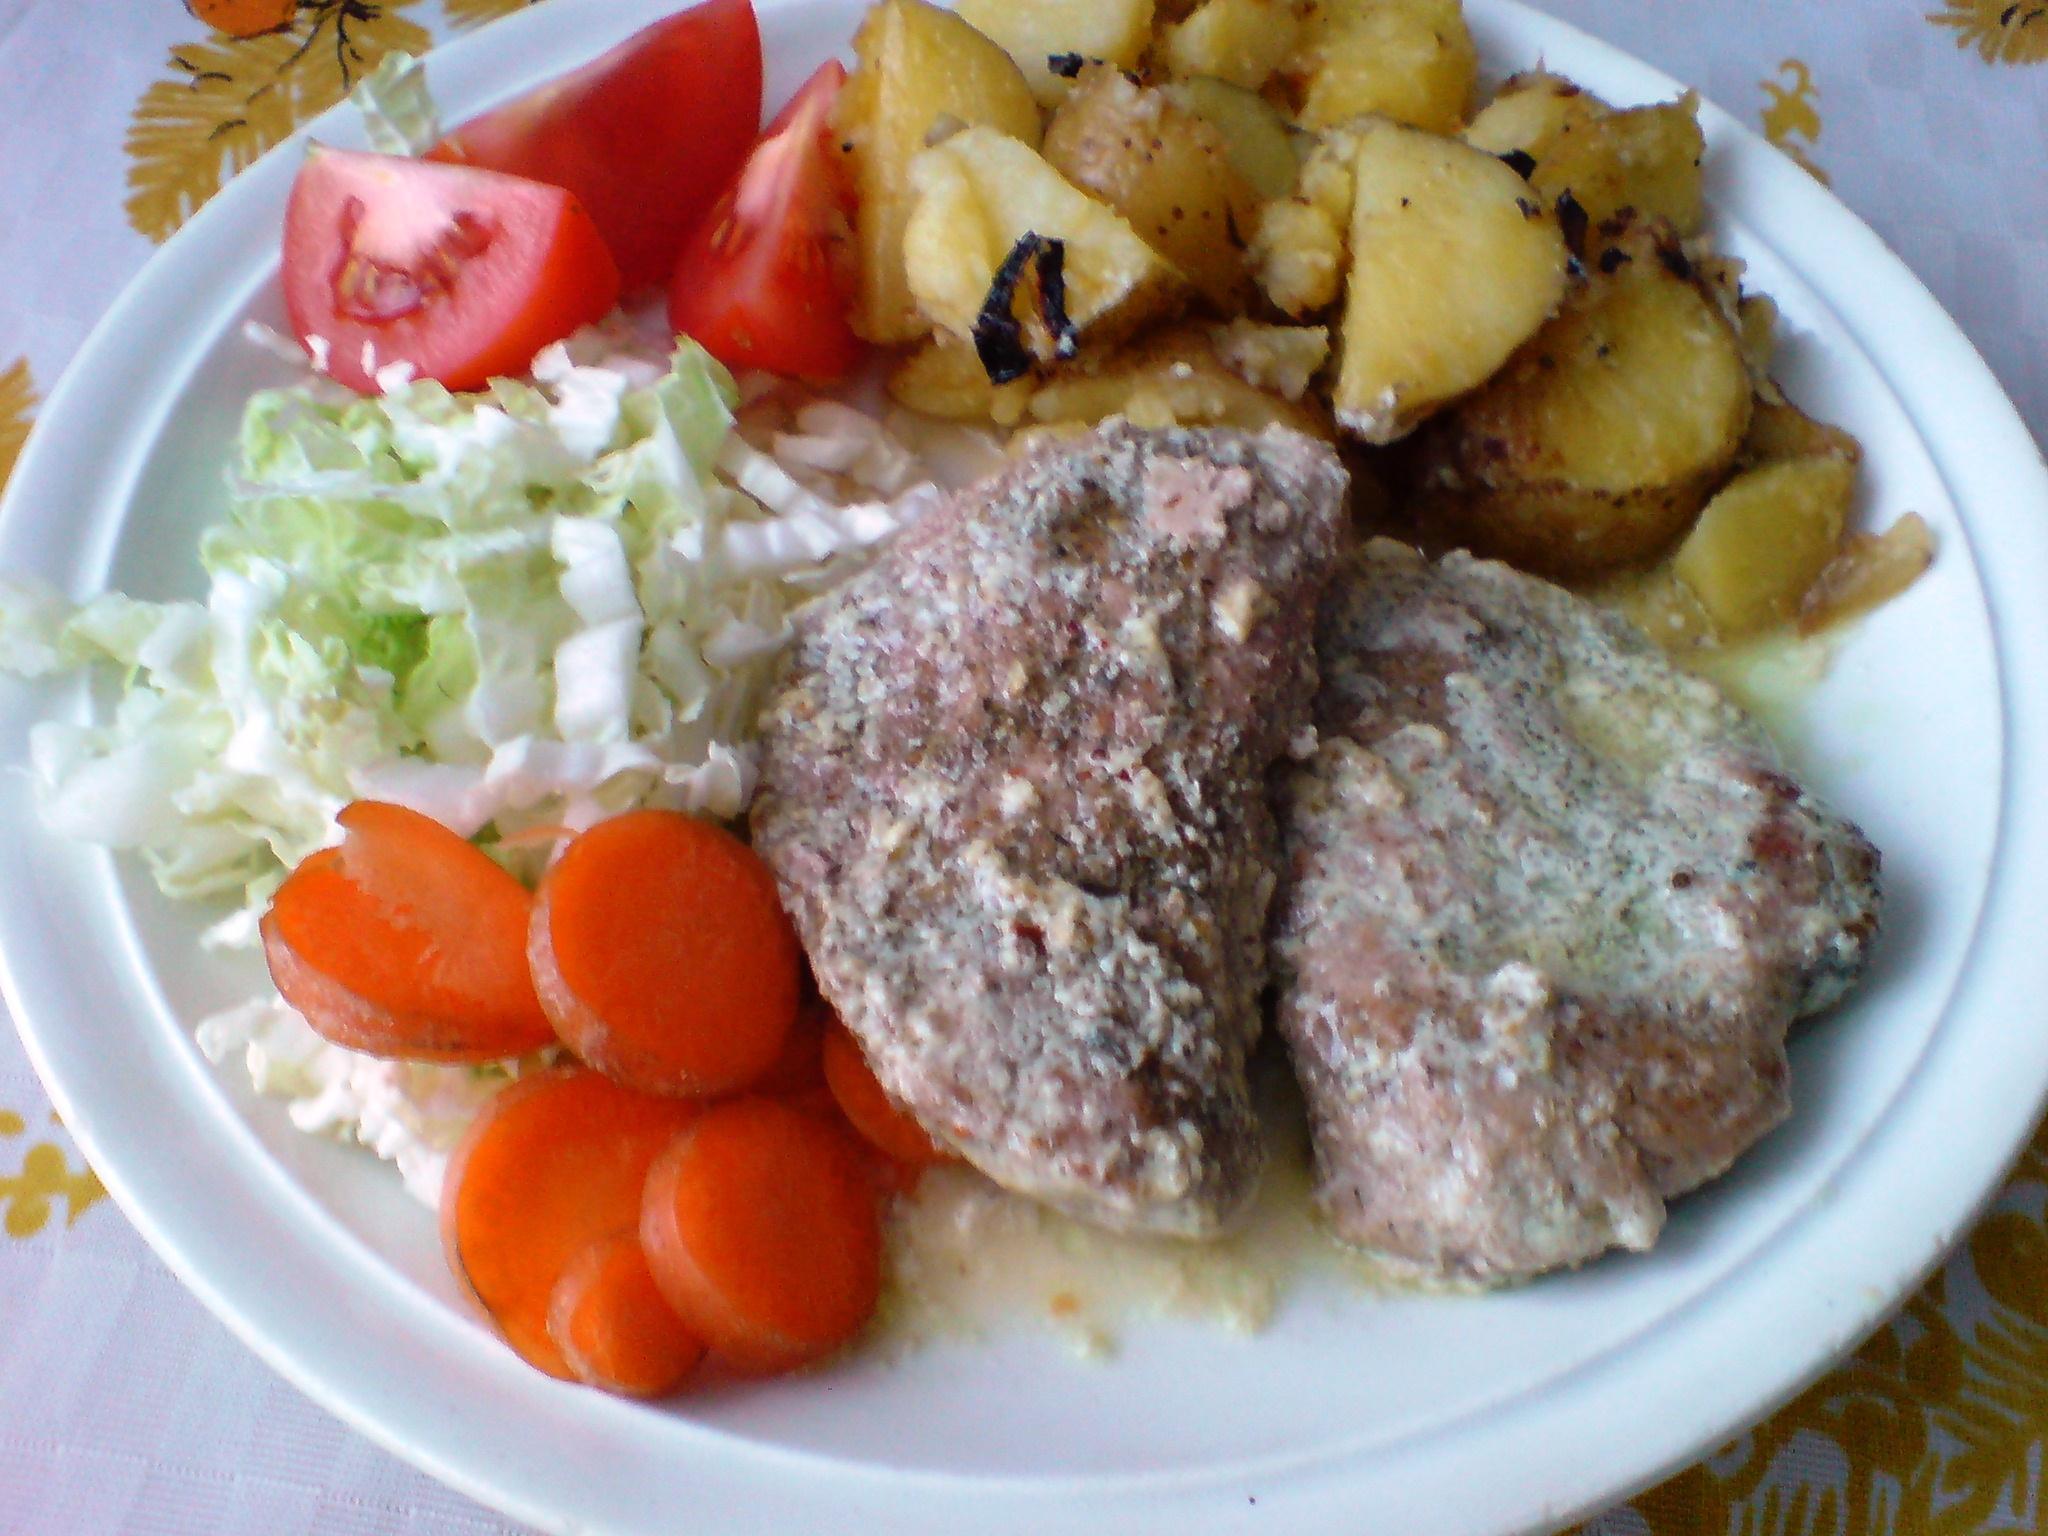 Recept Vepřové s adžikou - Vepřové maso s adžikou.